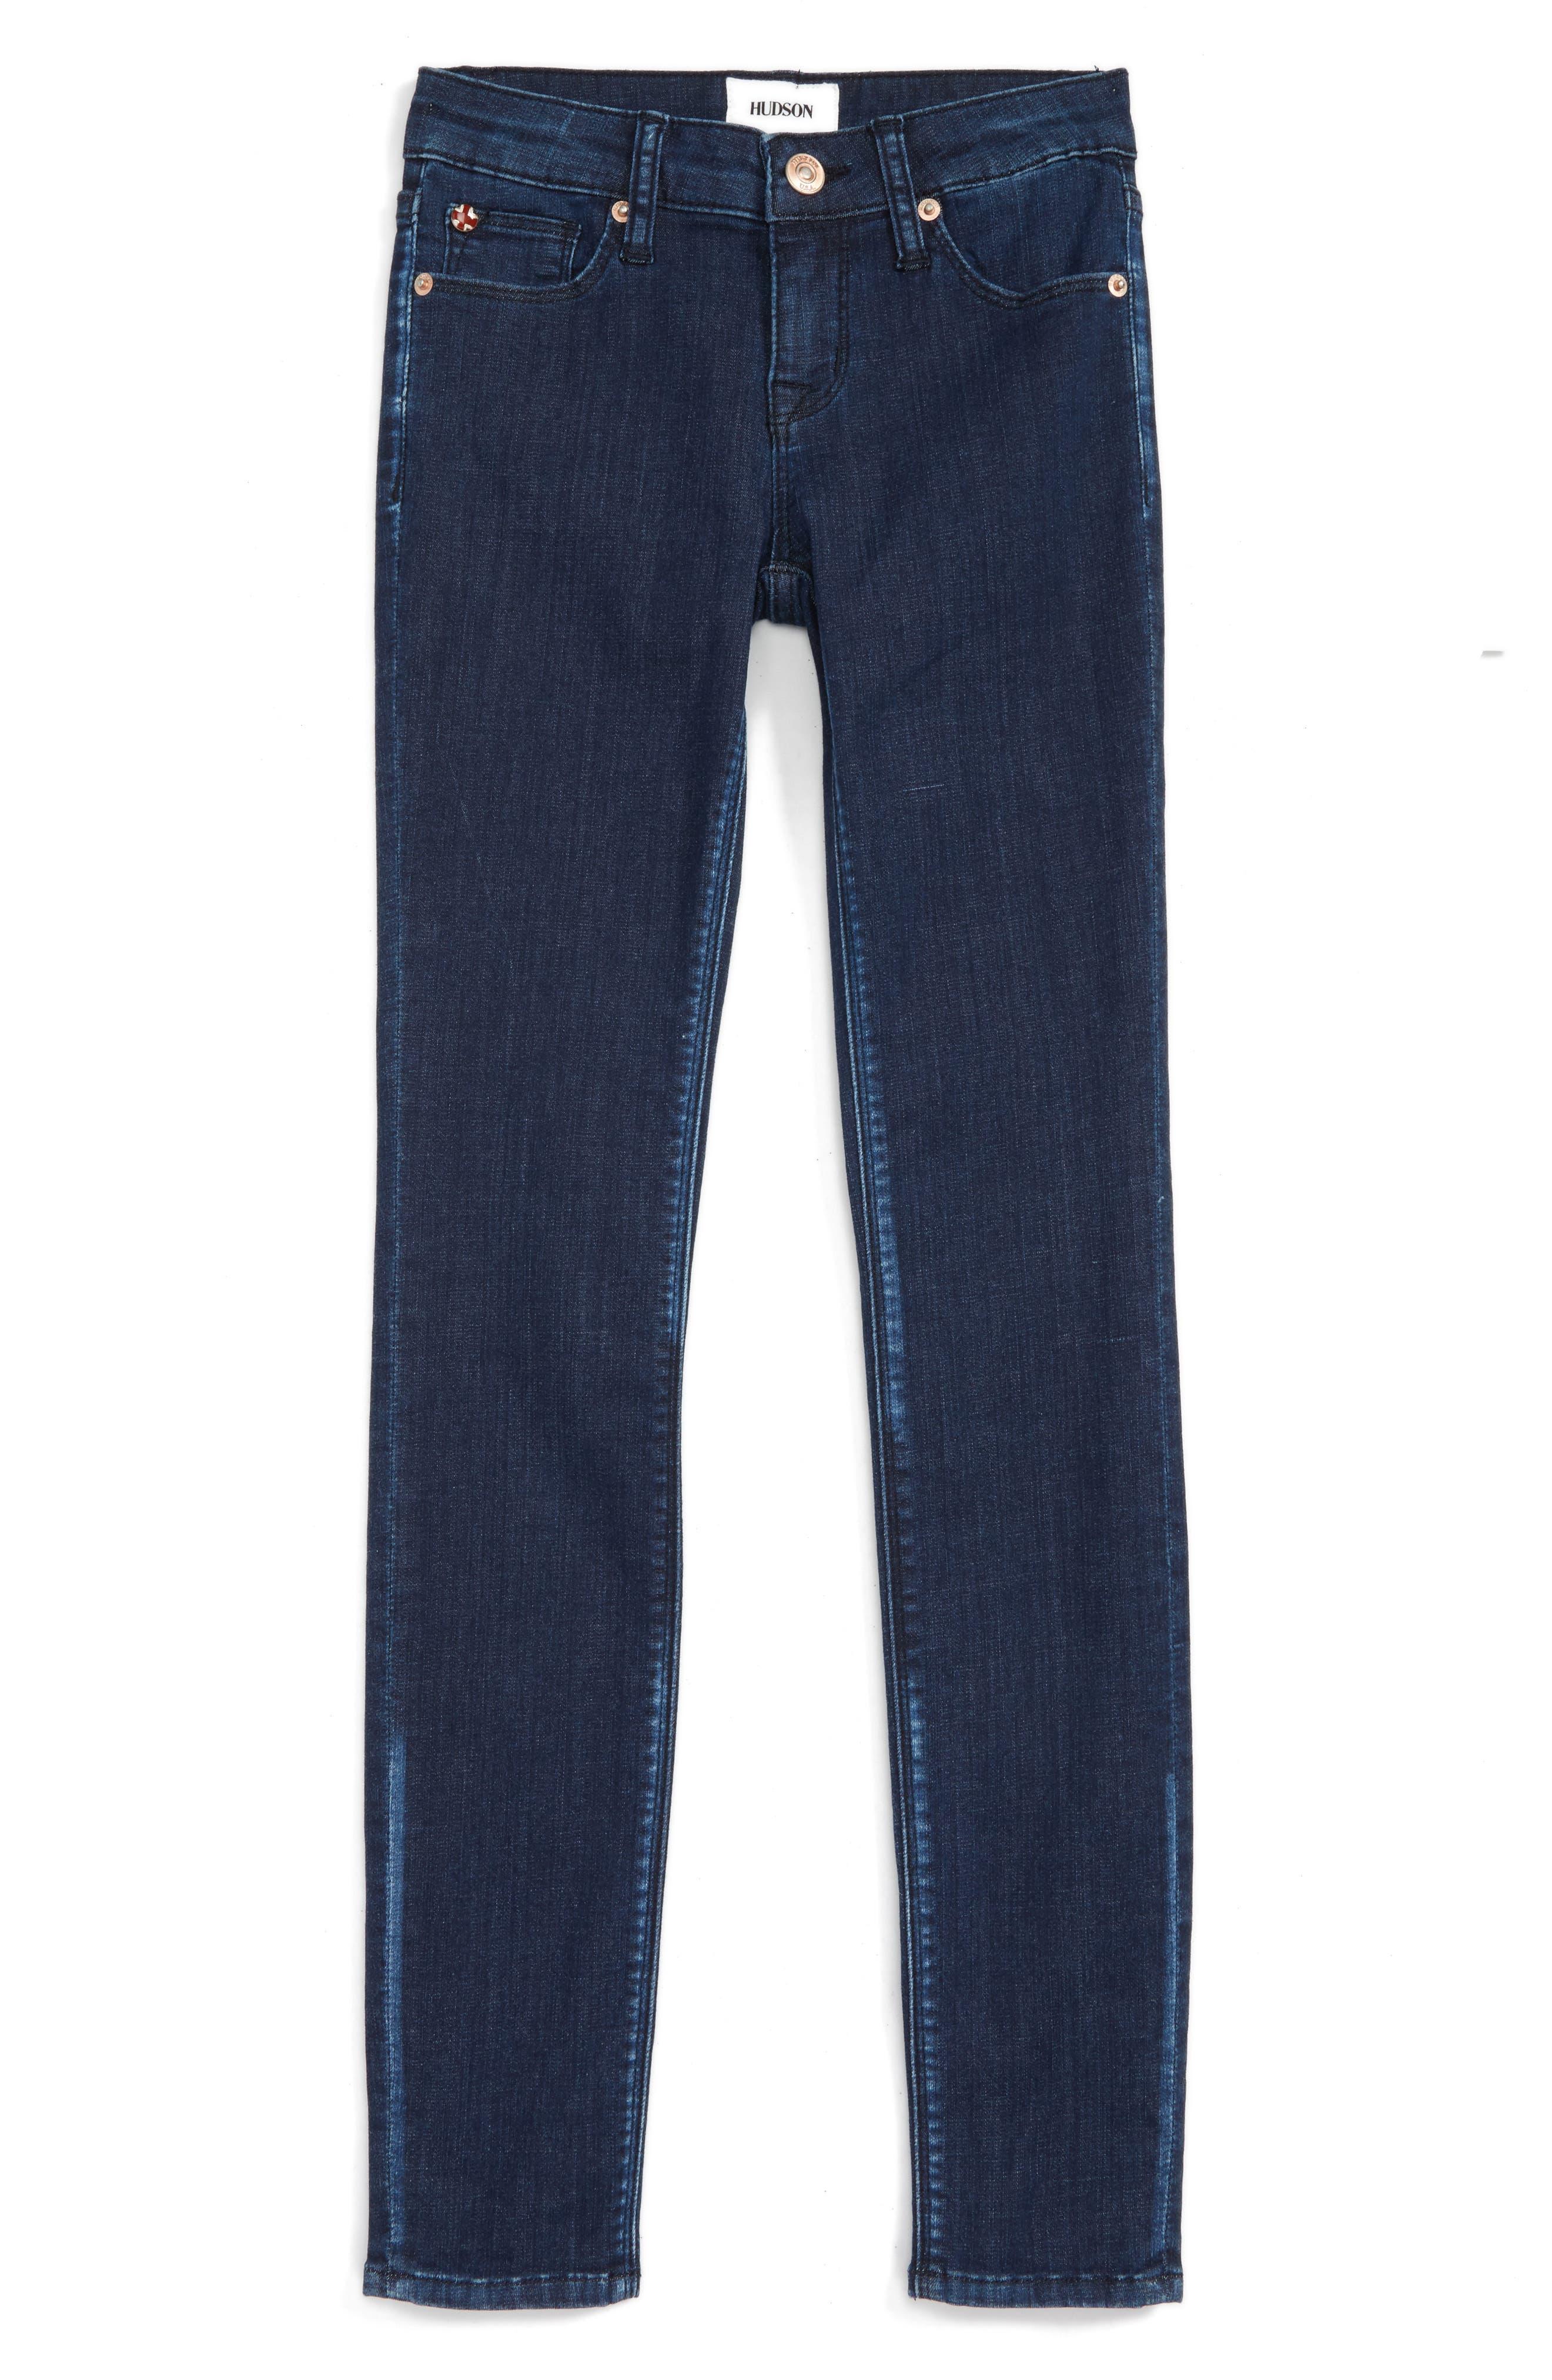 Alternate Image 1 Selected - Hudson Kids Dolly Skinny Jeans (Big Girls)